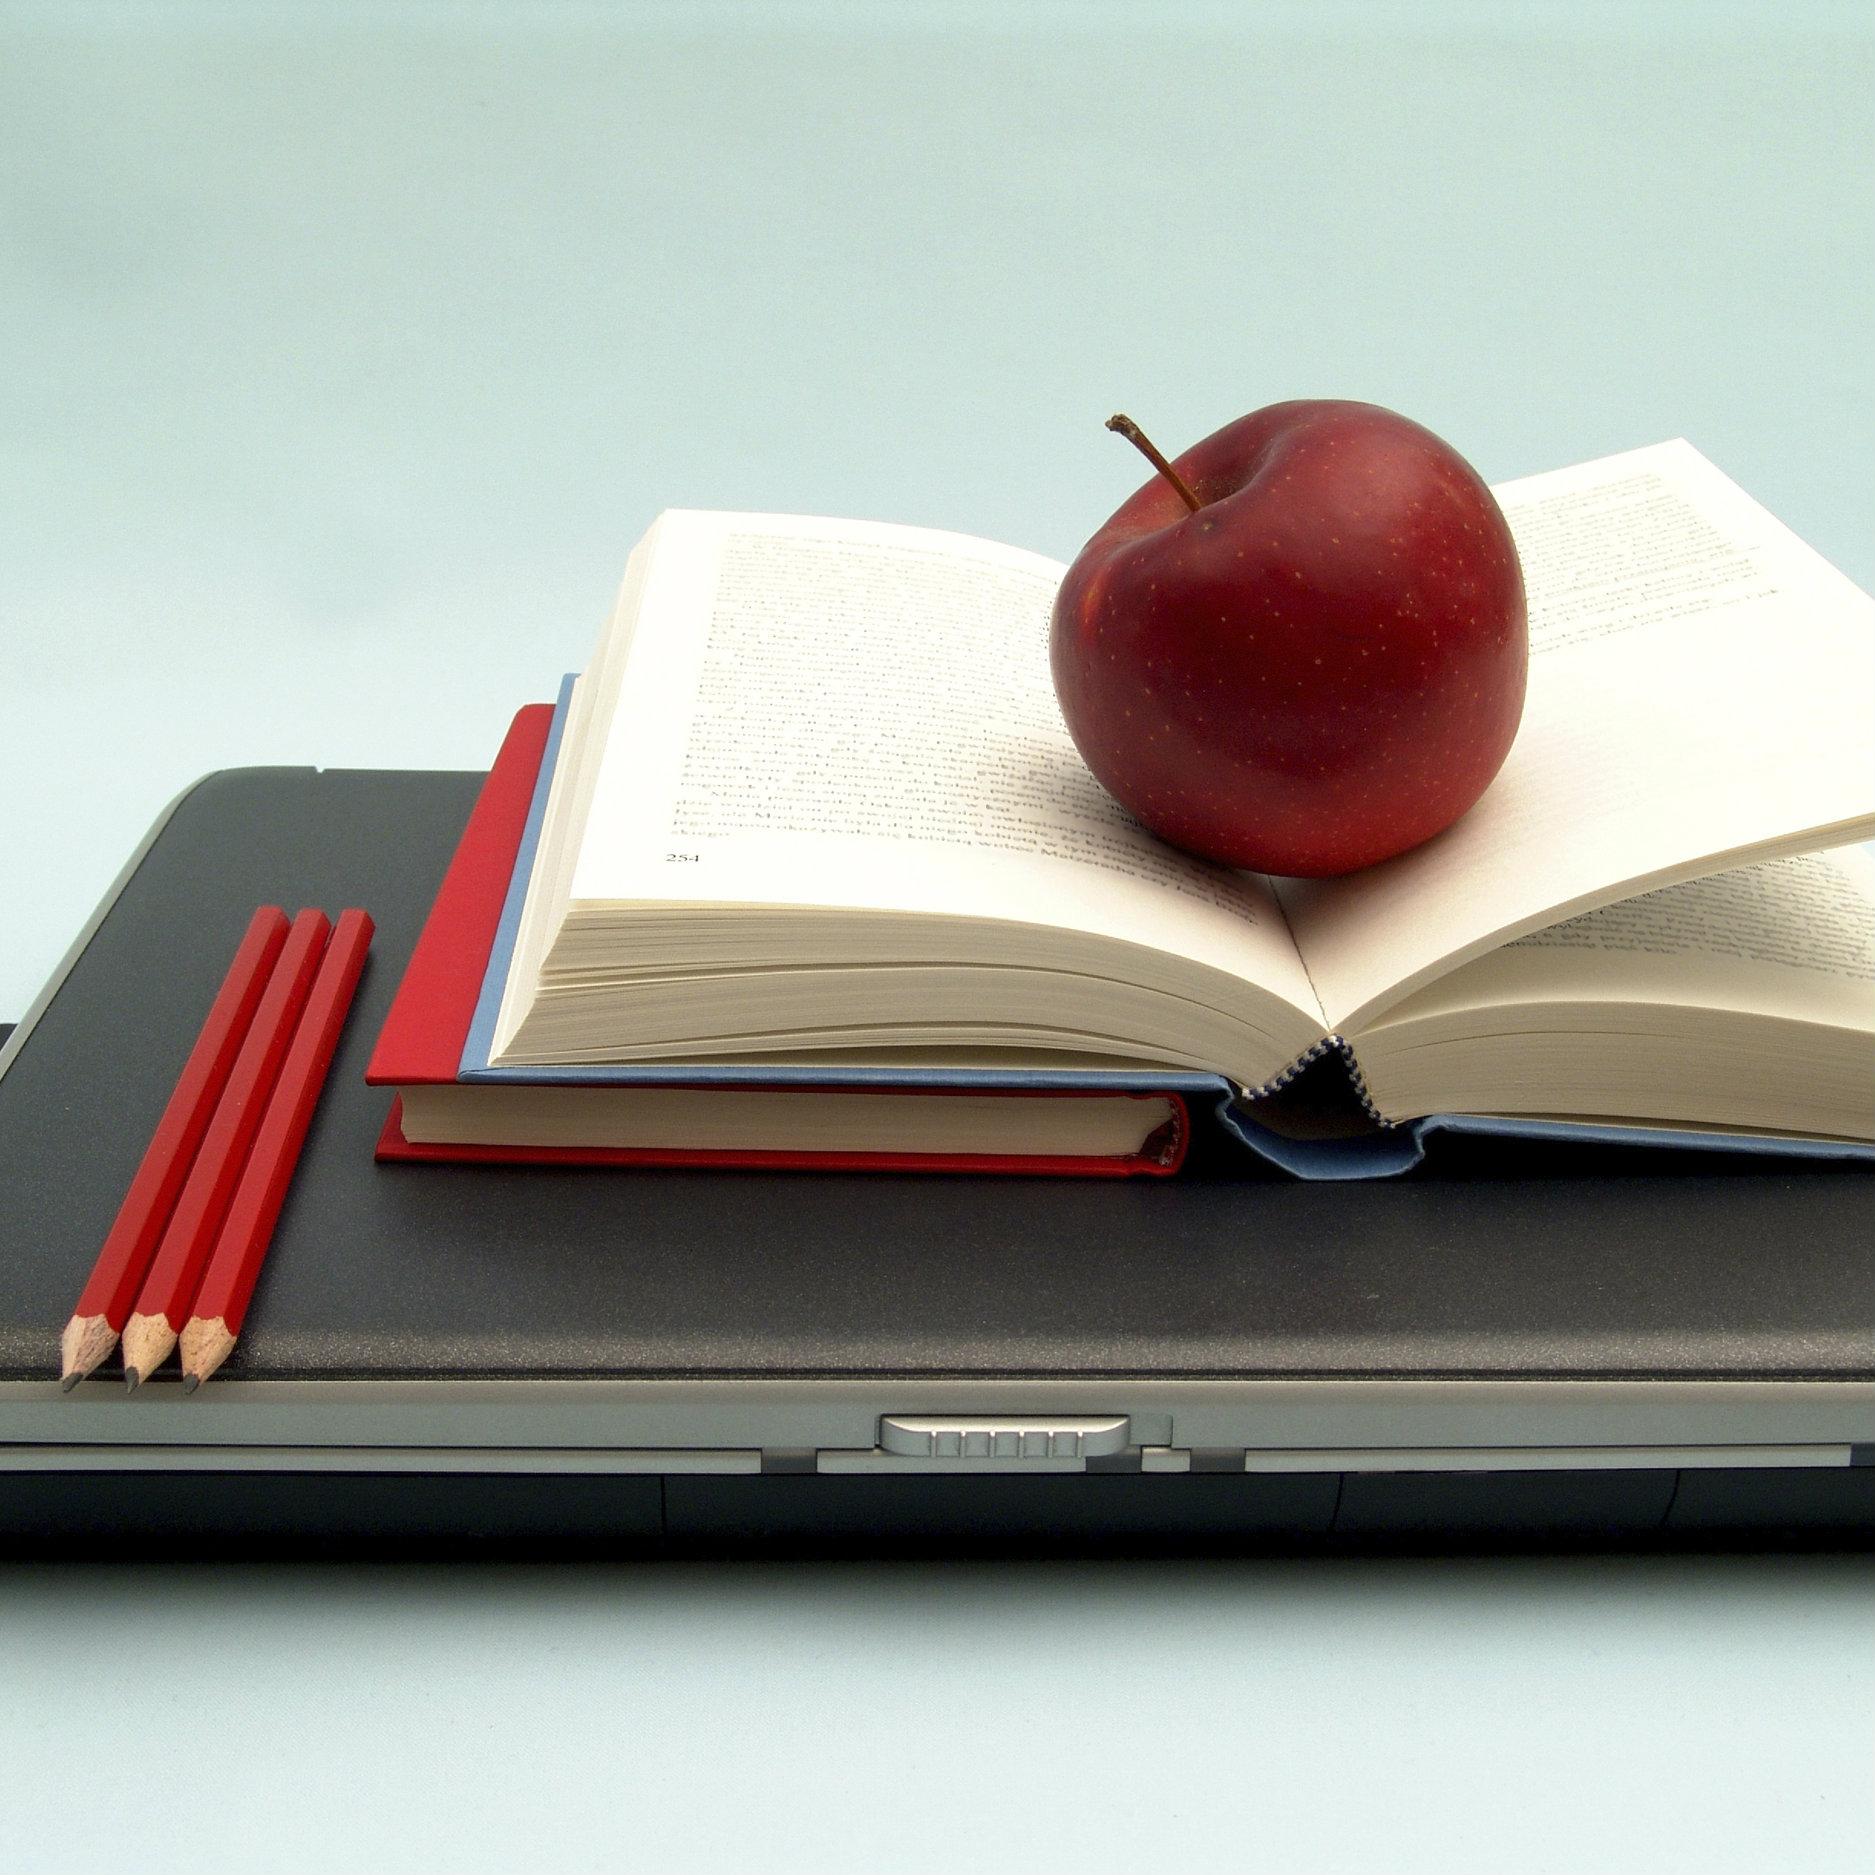 AAR Scholarship